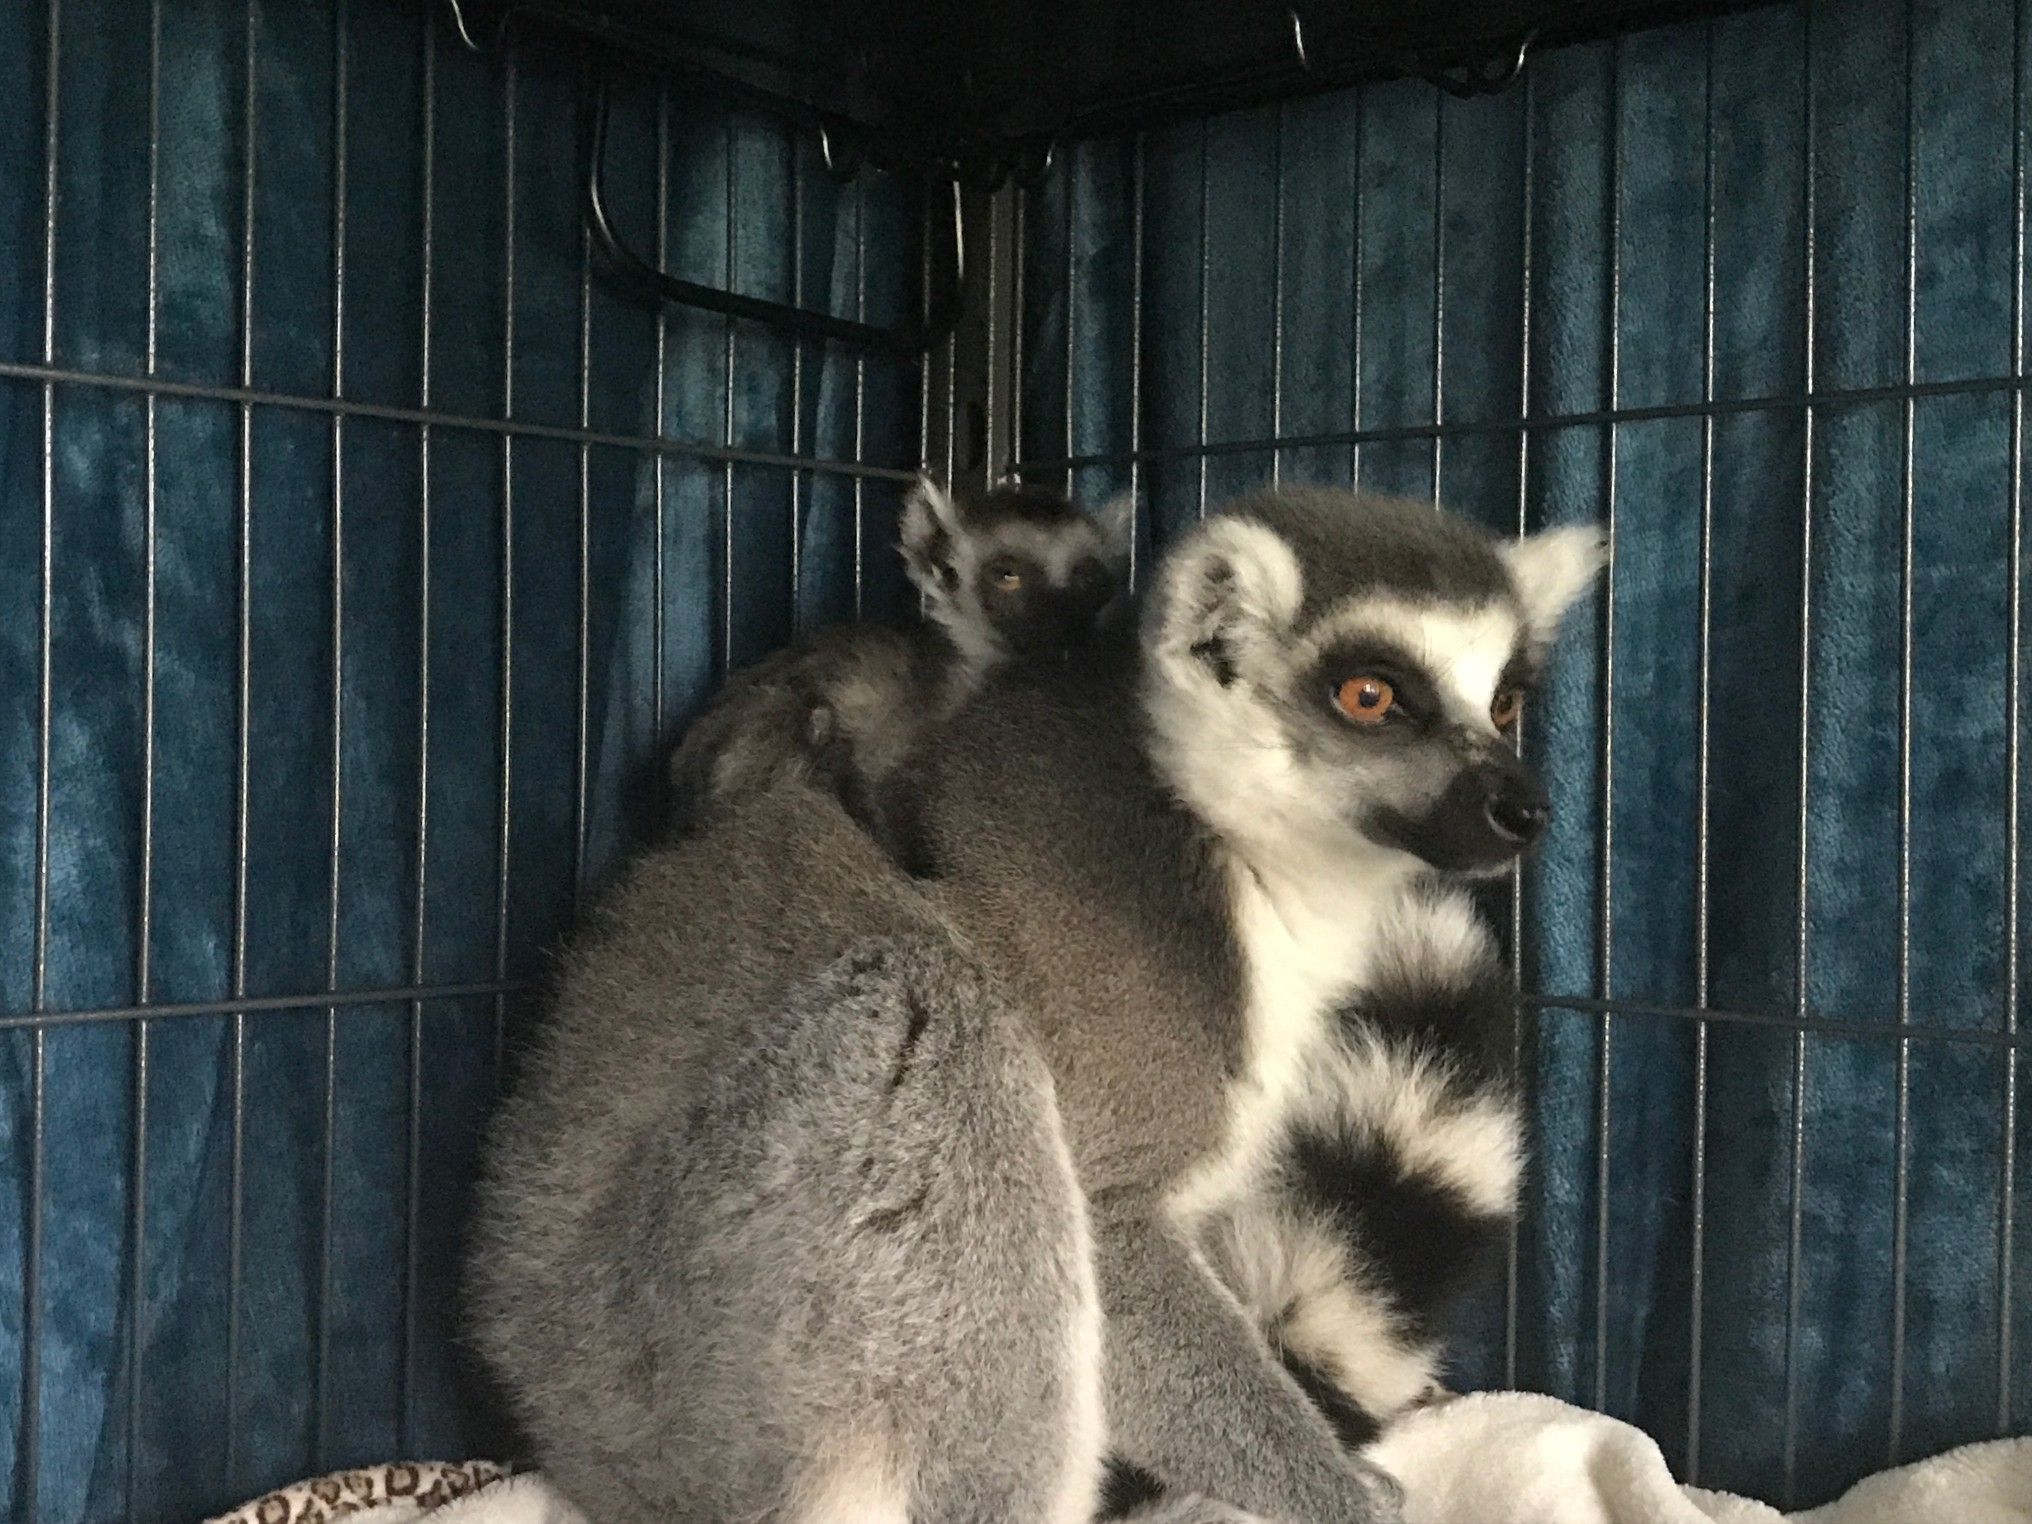 Mom and baby lemur